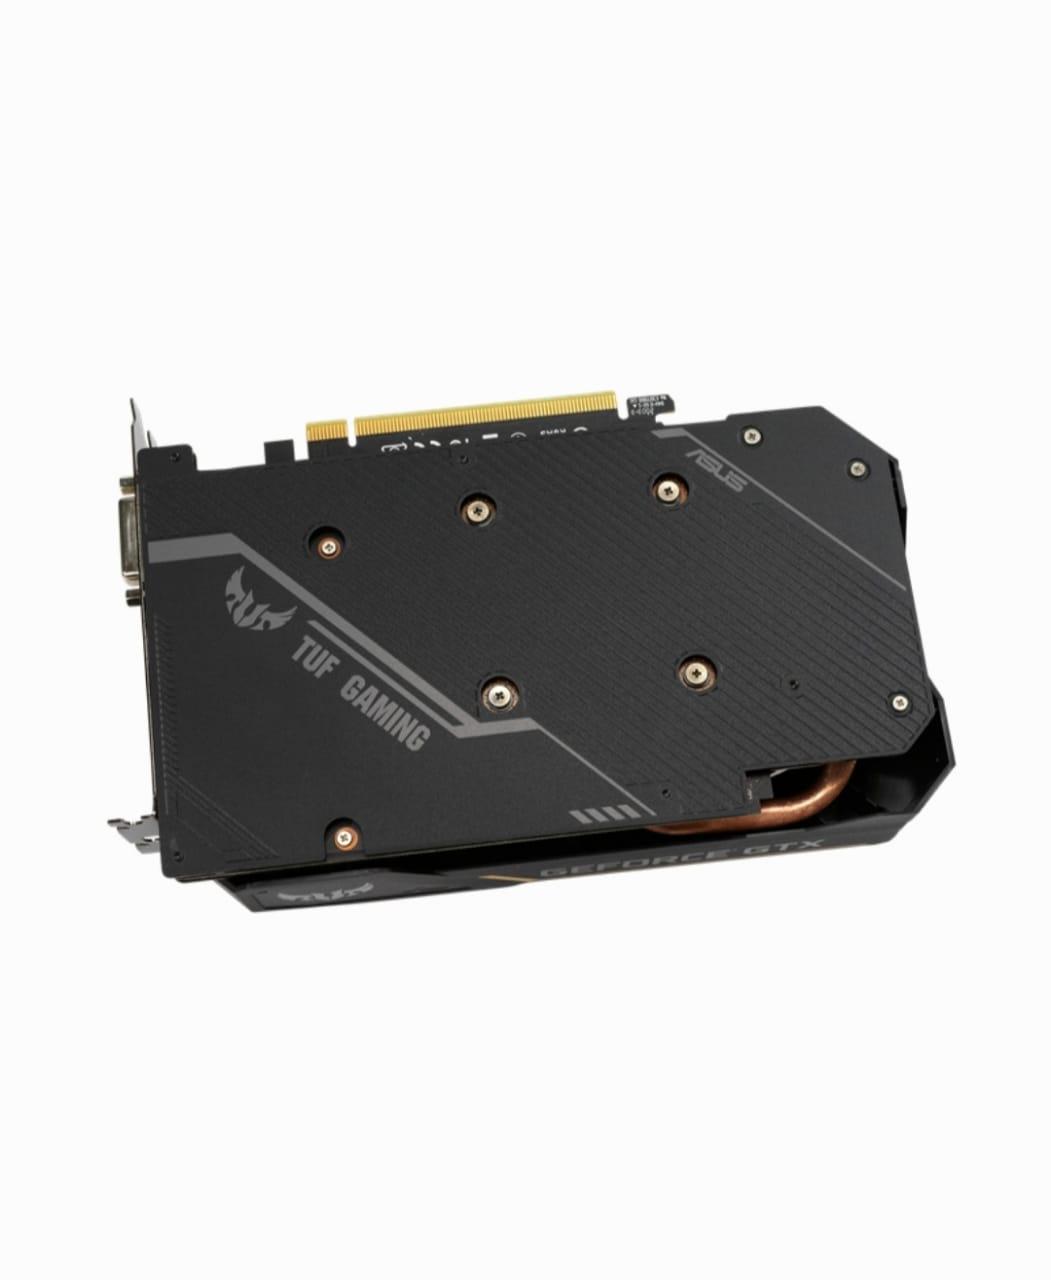 PLACA DE VÍDEO GEFORCE GTX 1650 4GB GDDR6 TUF-GTX1650-O4GD6-GAMING - ASUS